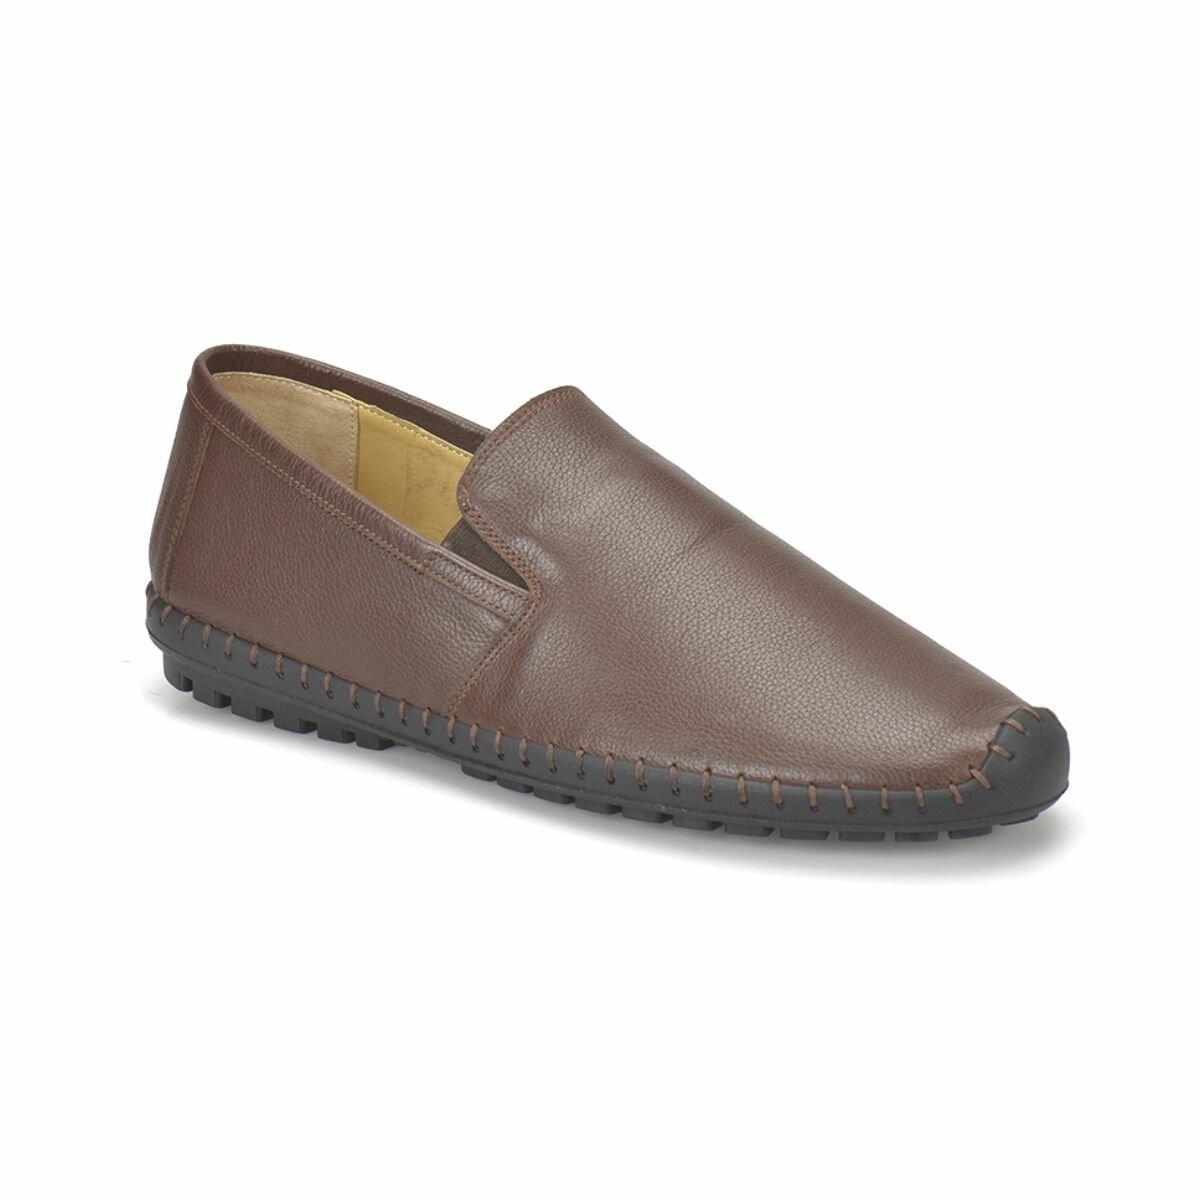 FLO G-88 M 1455 Brown Men 'S Modern Shoes Flogart